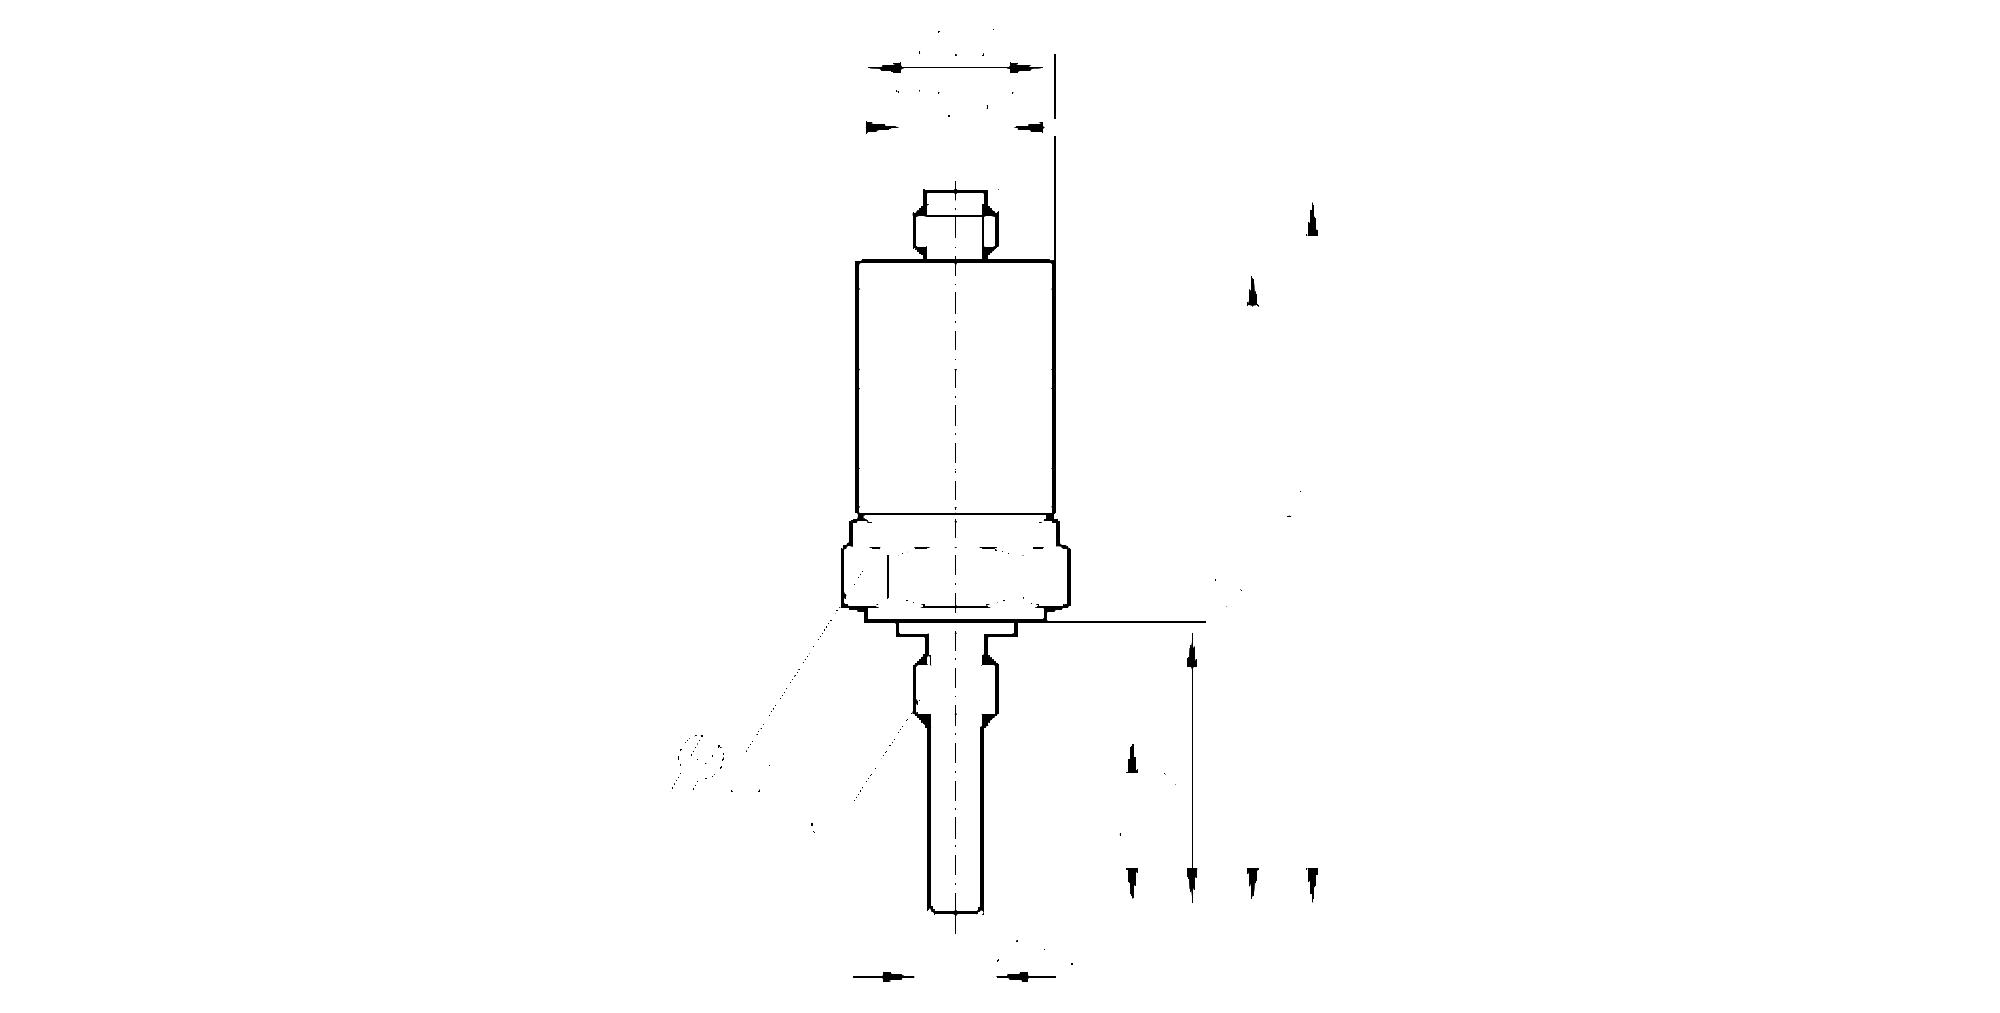 tk7130